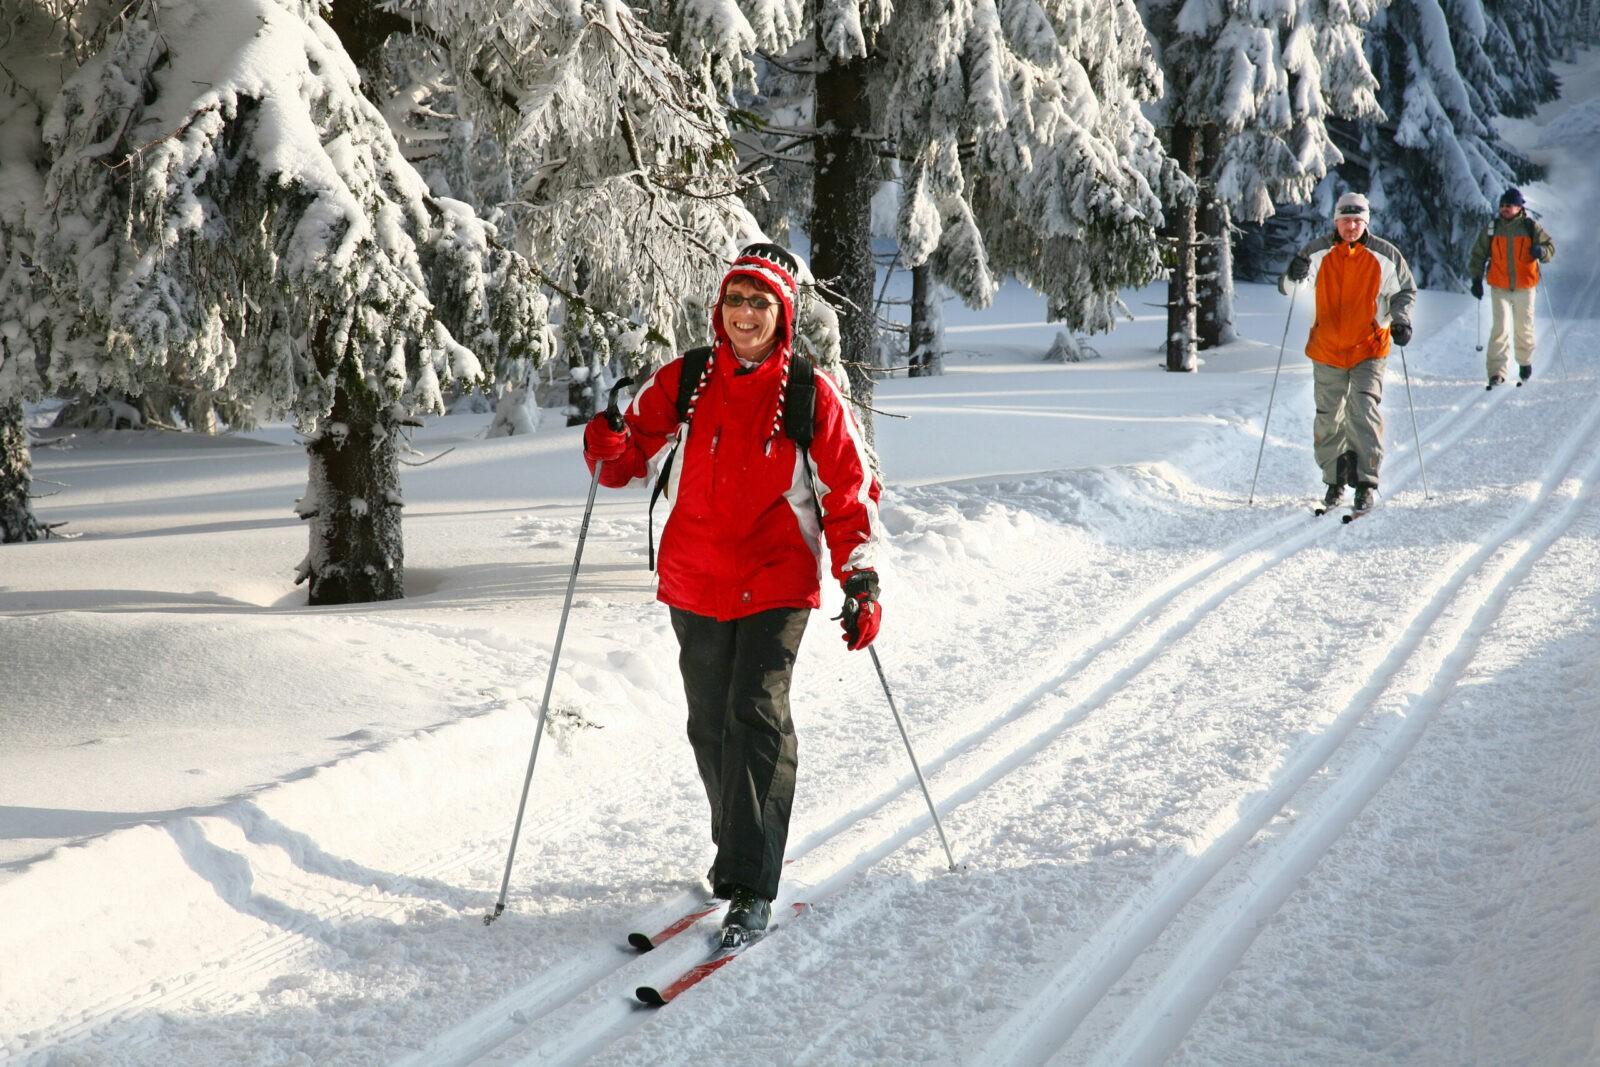 Skifahren im Thüringer Wald | Foto: Barbara Neumann/TTG